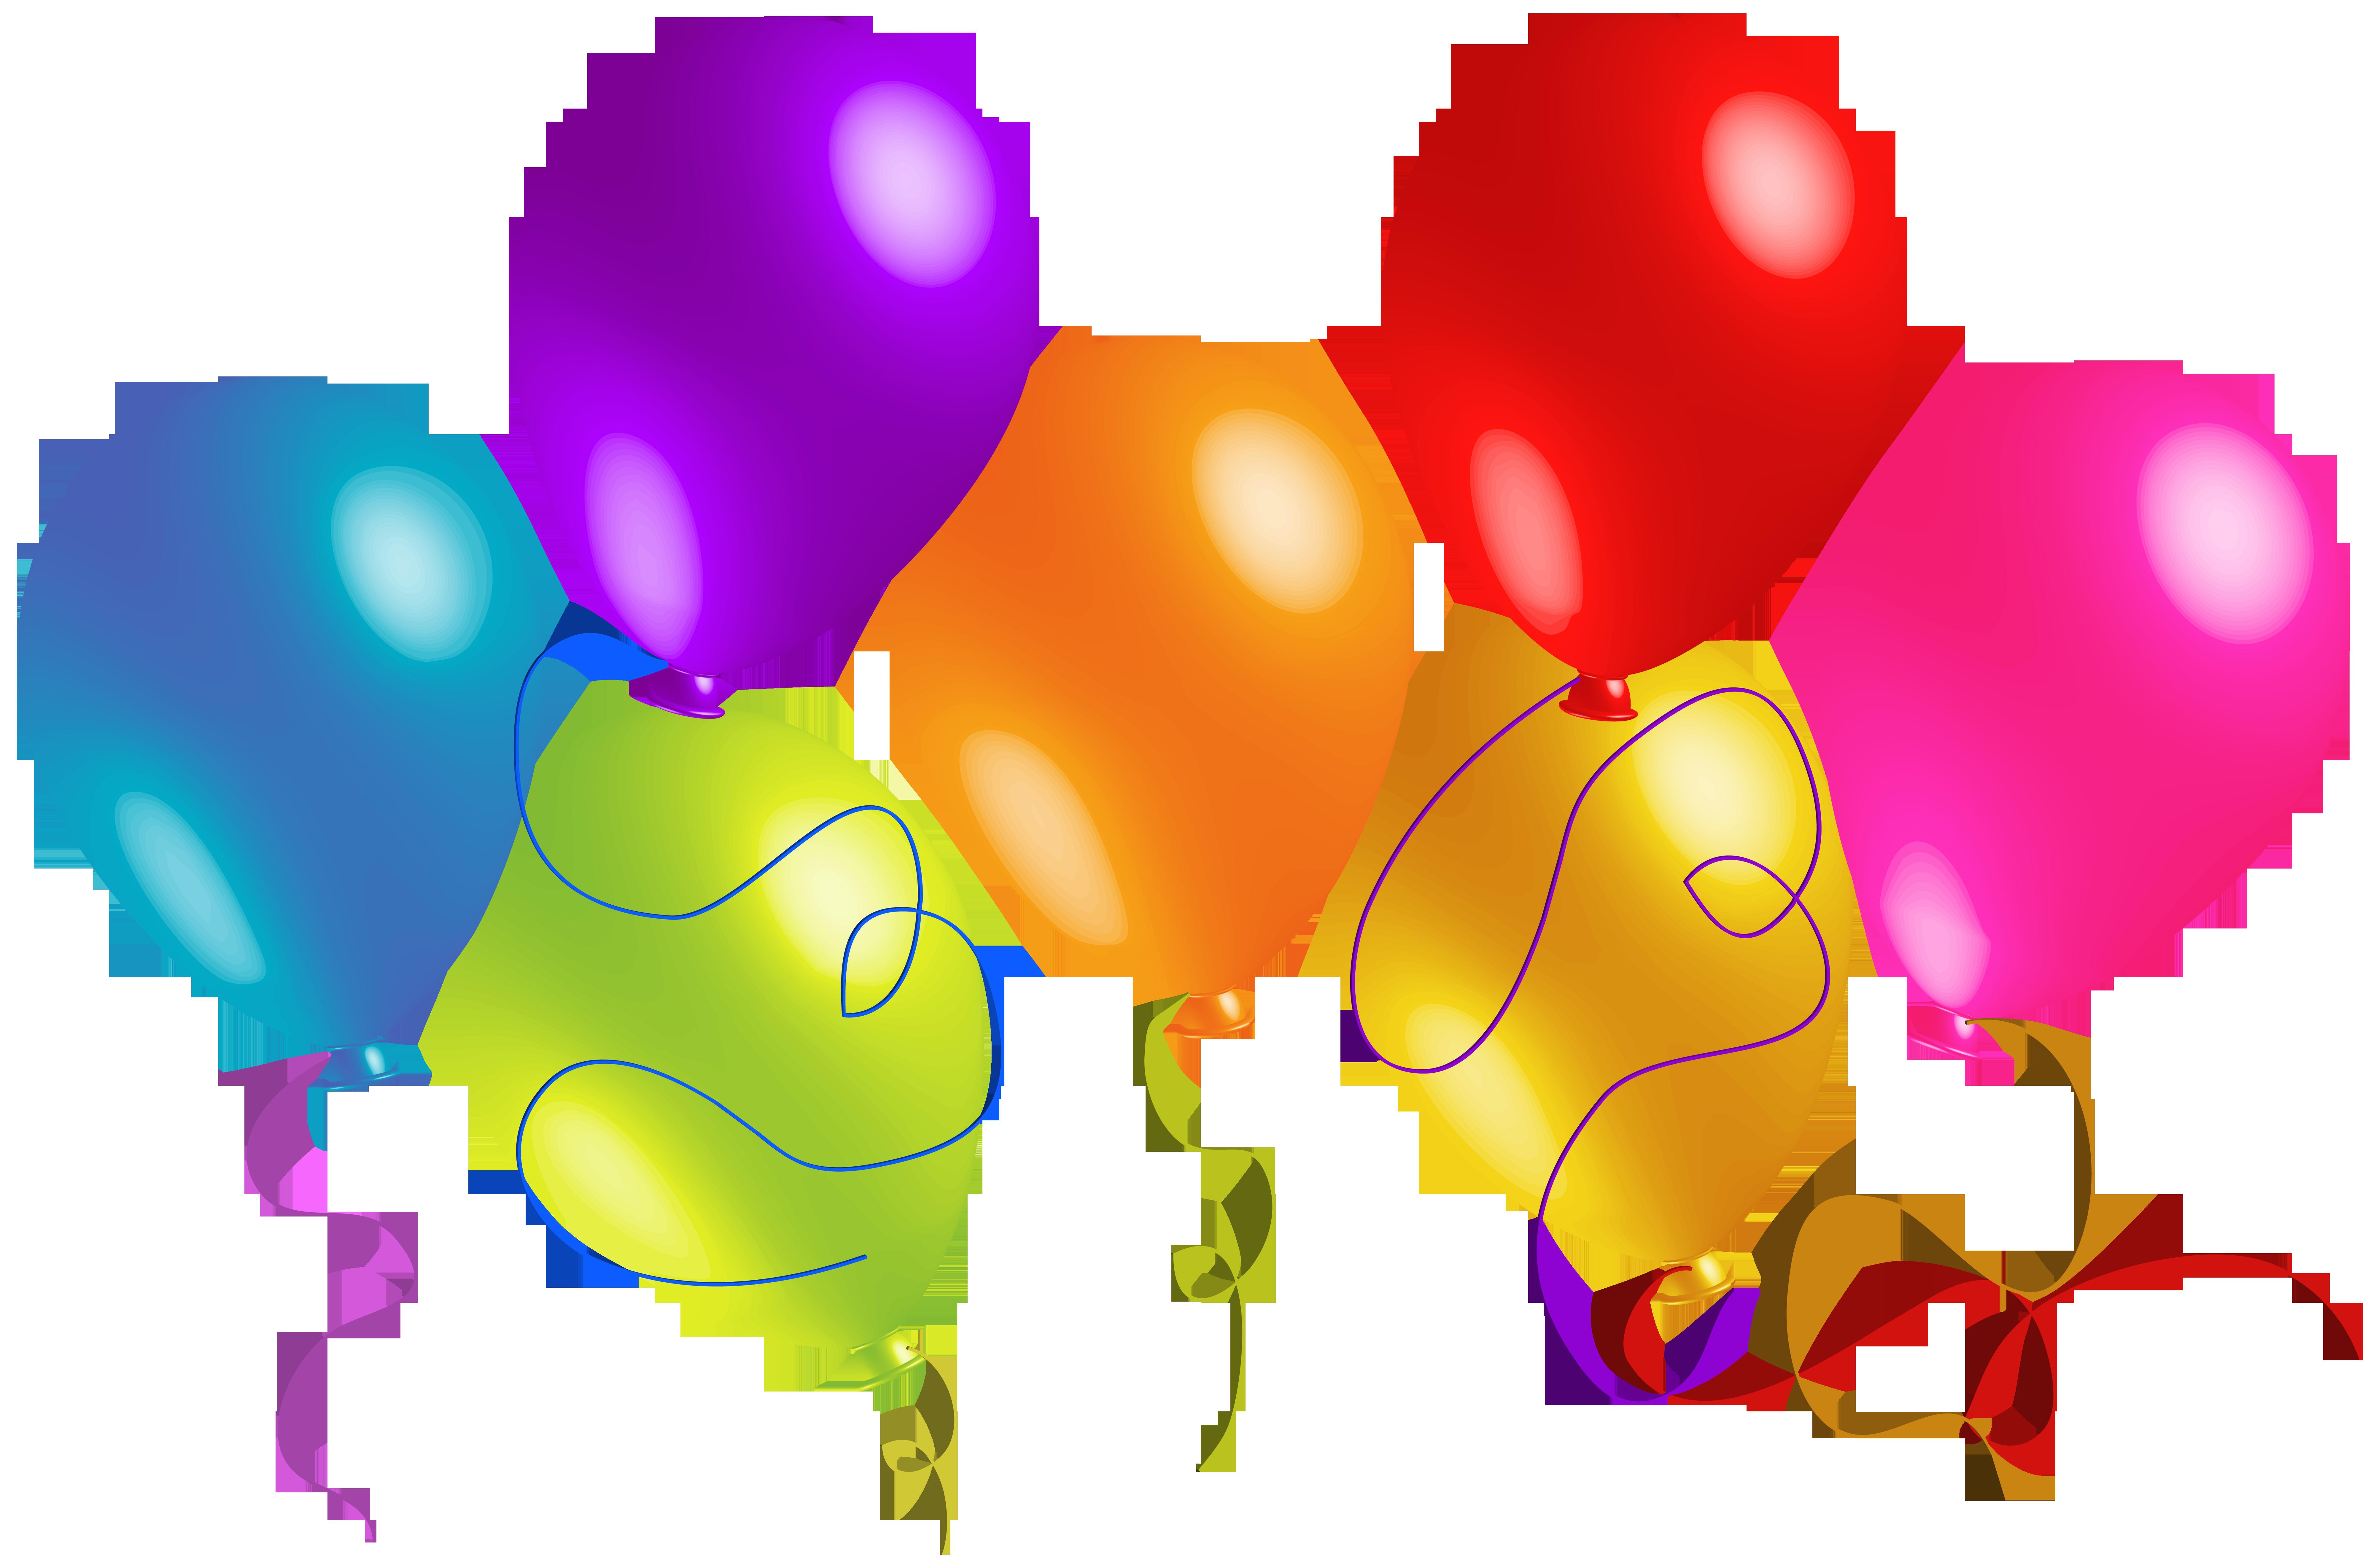 clip art transparent library Large transparent colorful balloons. Grades clipart high grade